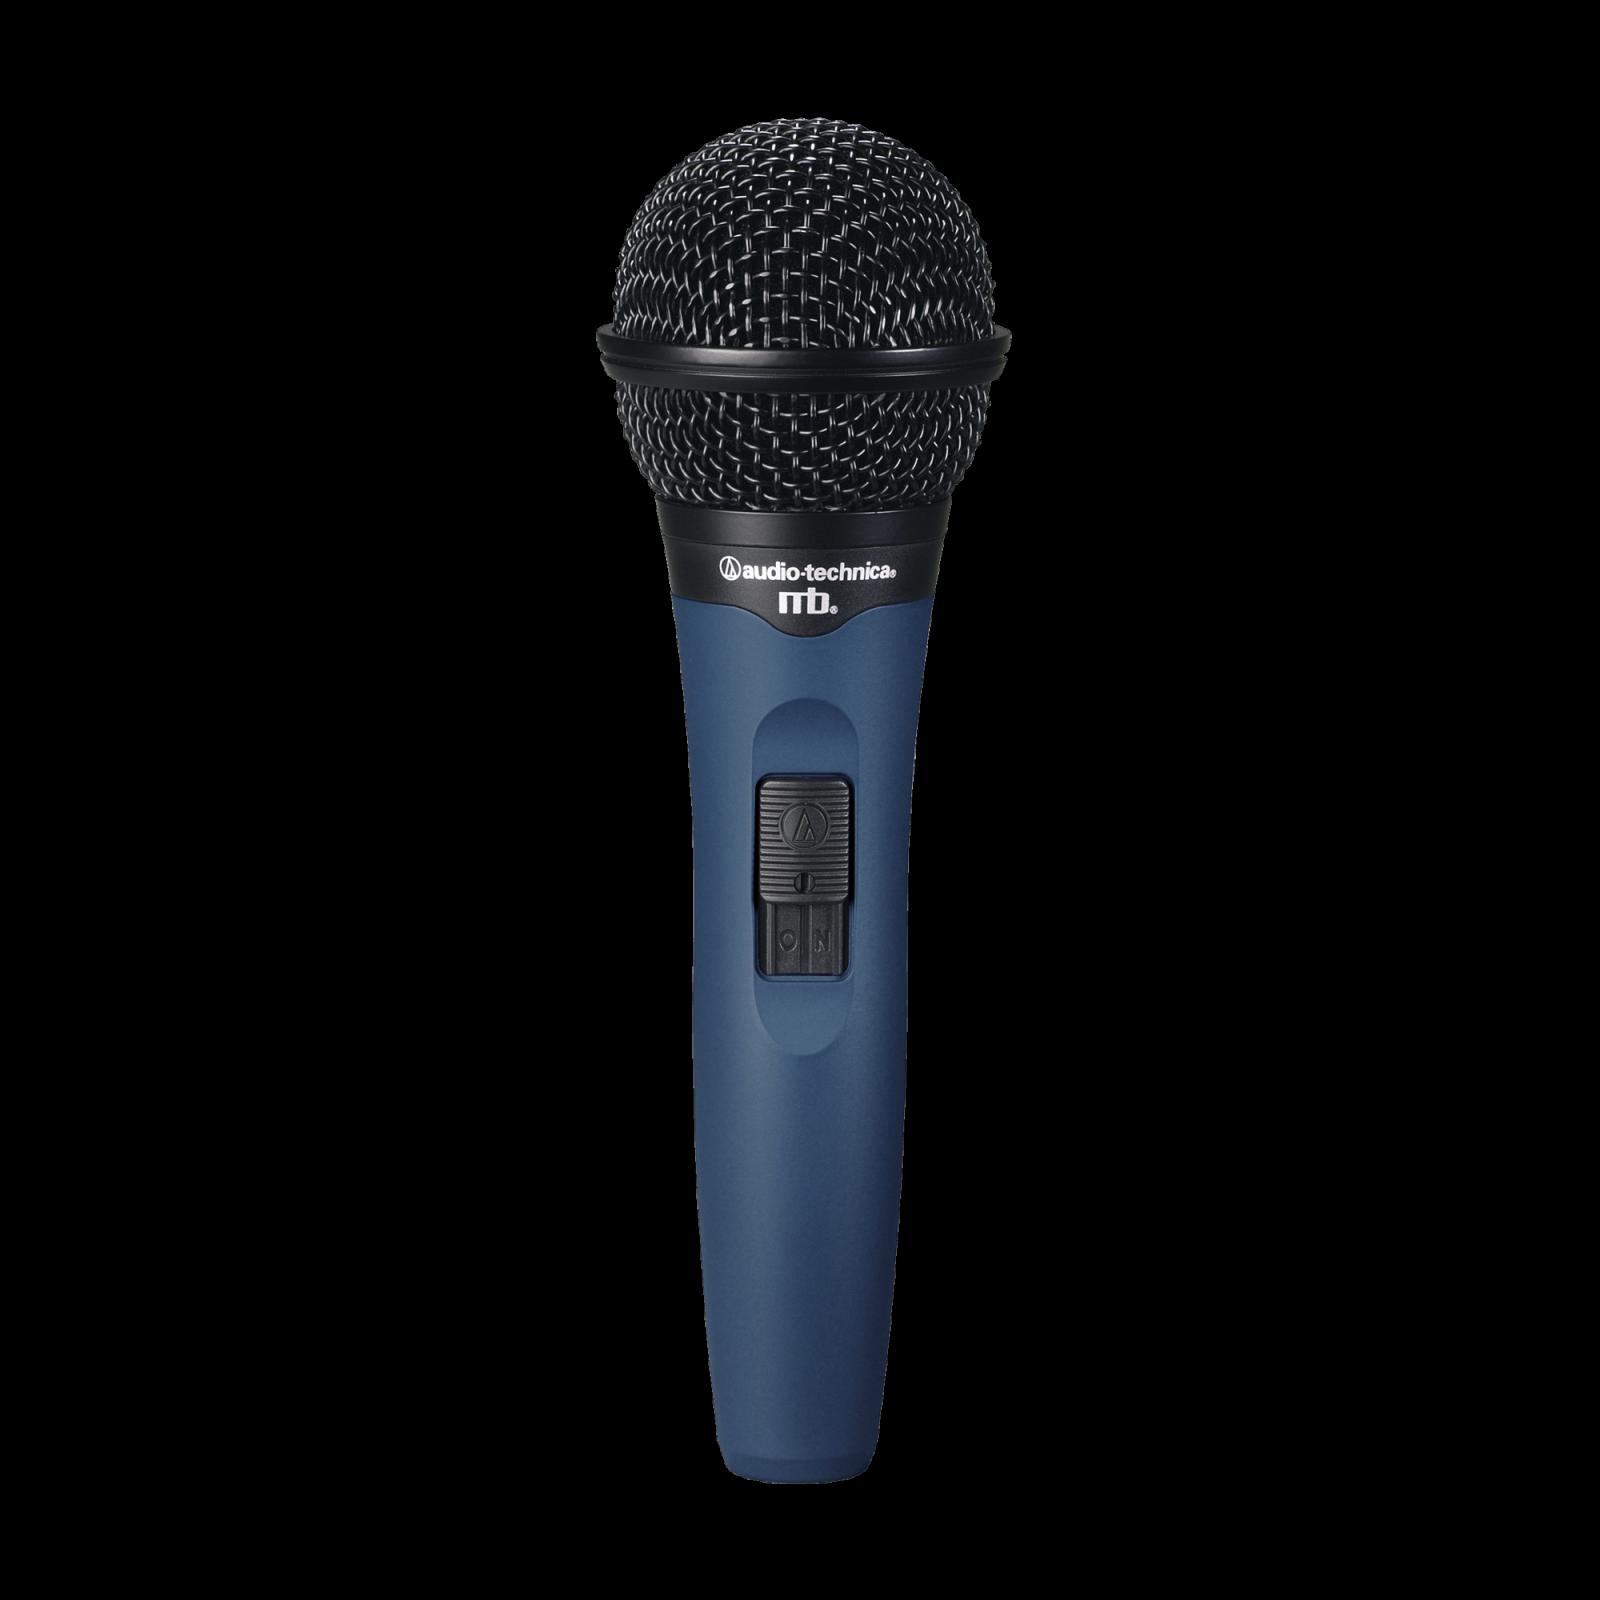 Audio Technica MB 1k Dynamic Microphone